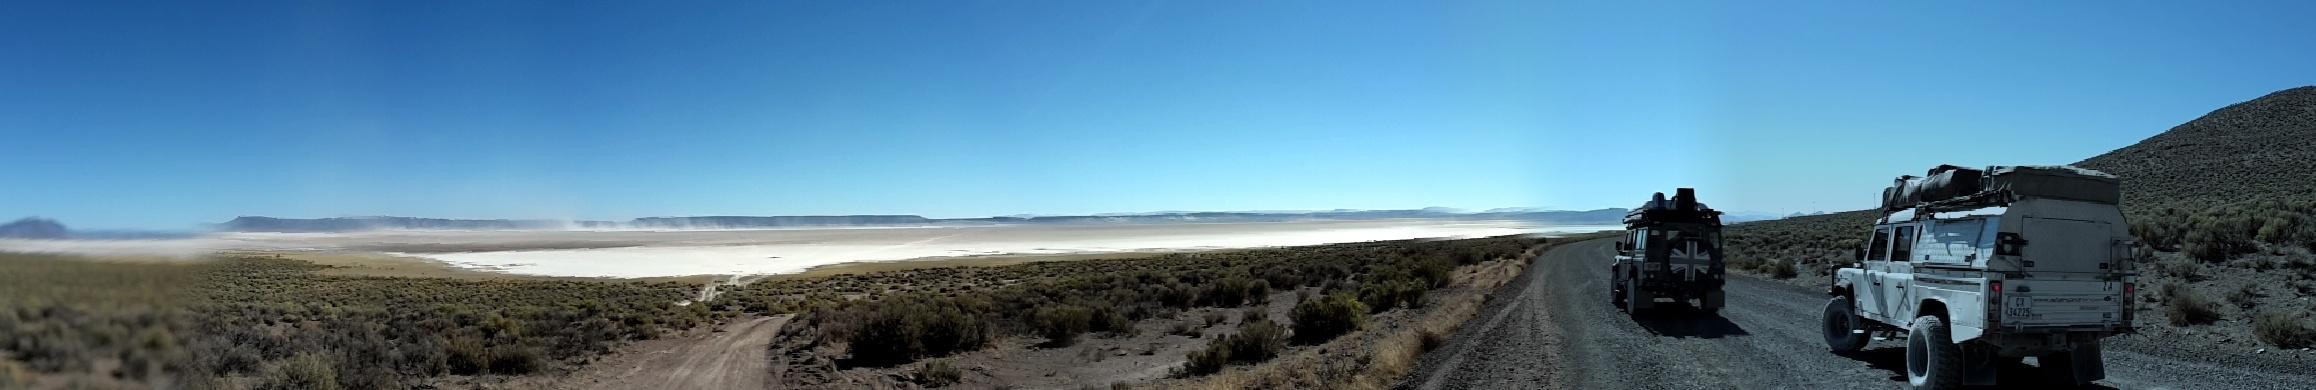 The Alvord Desert, Oregon. A2A